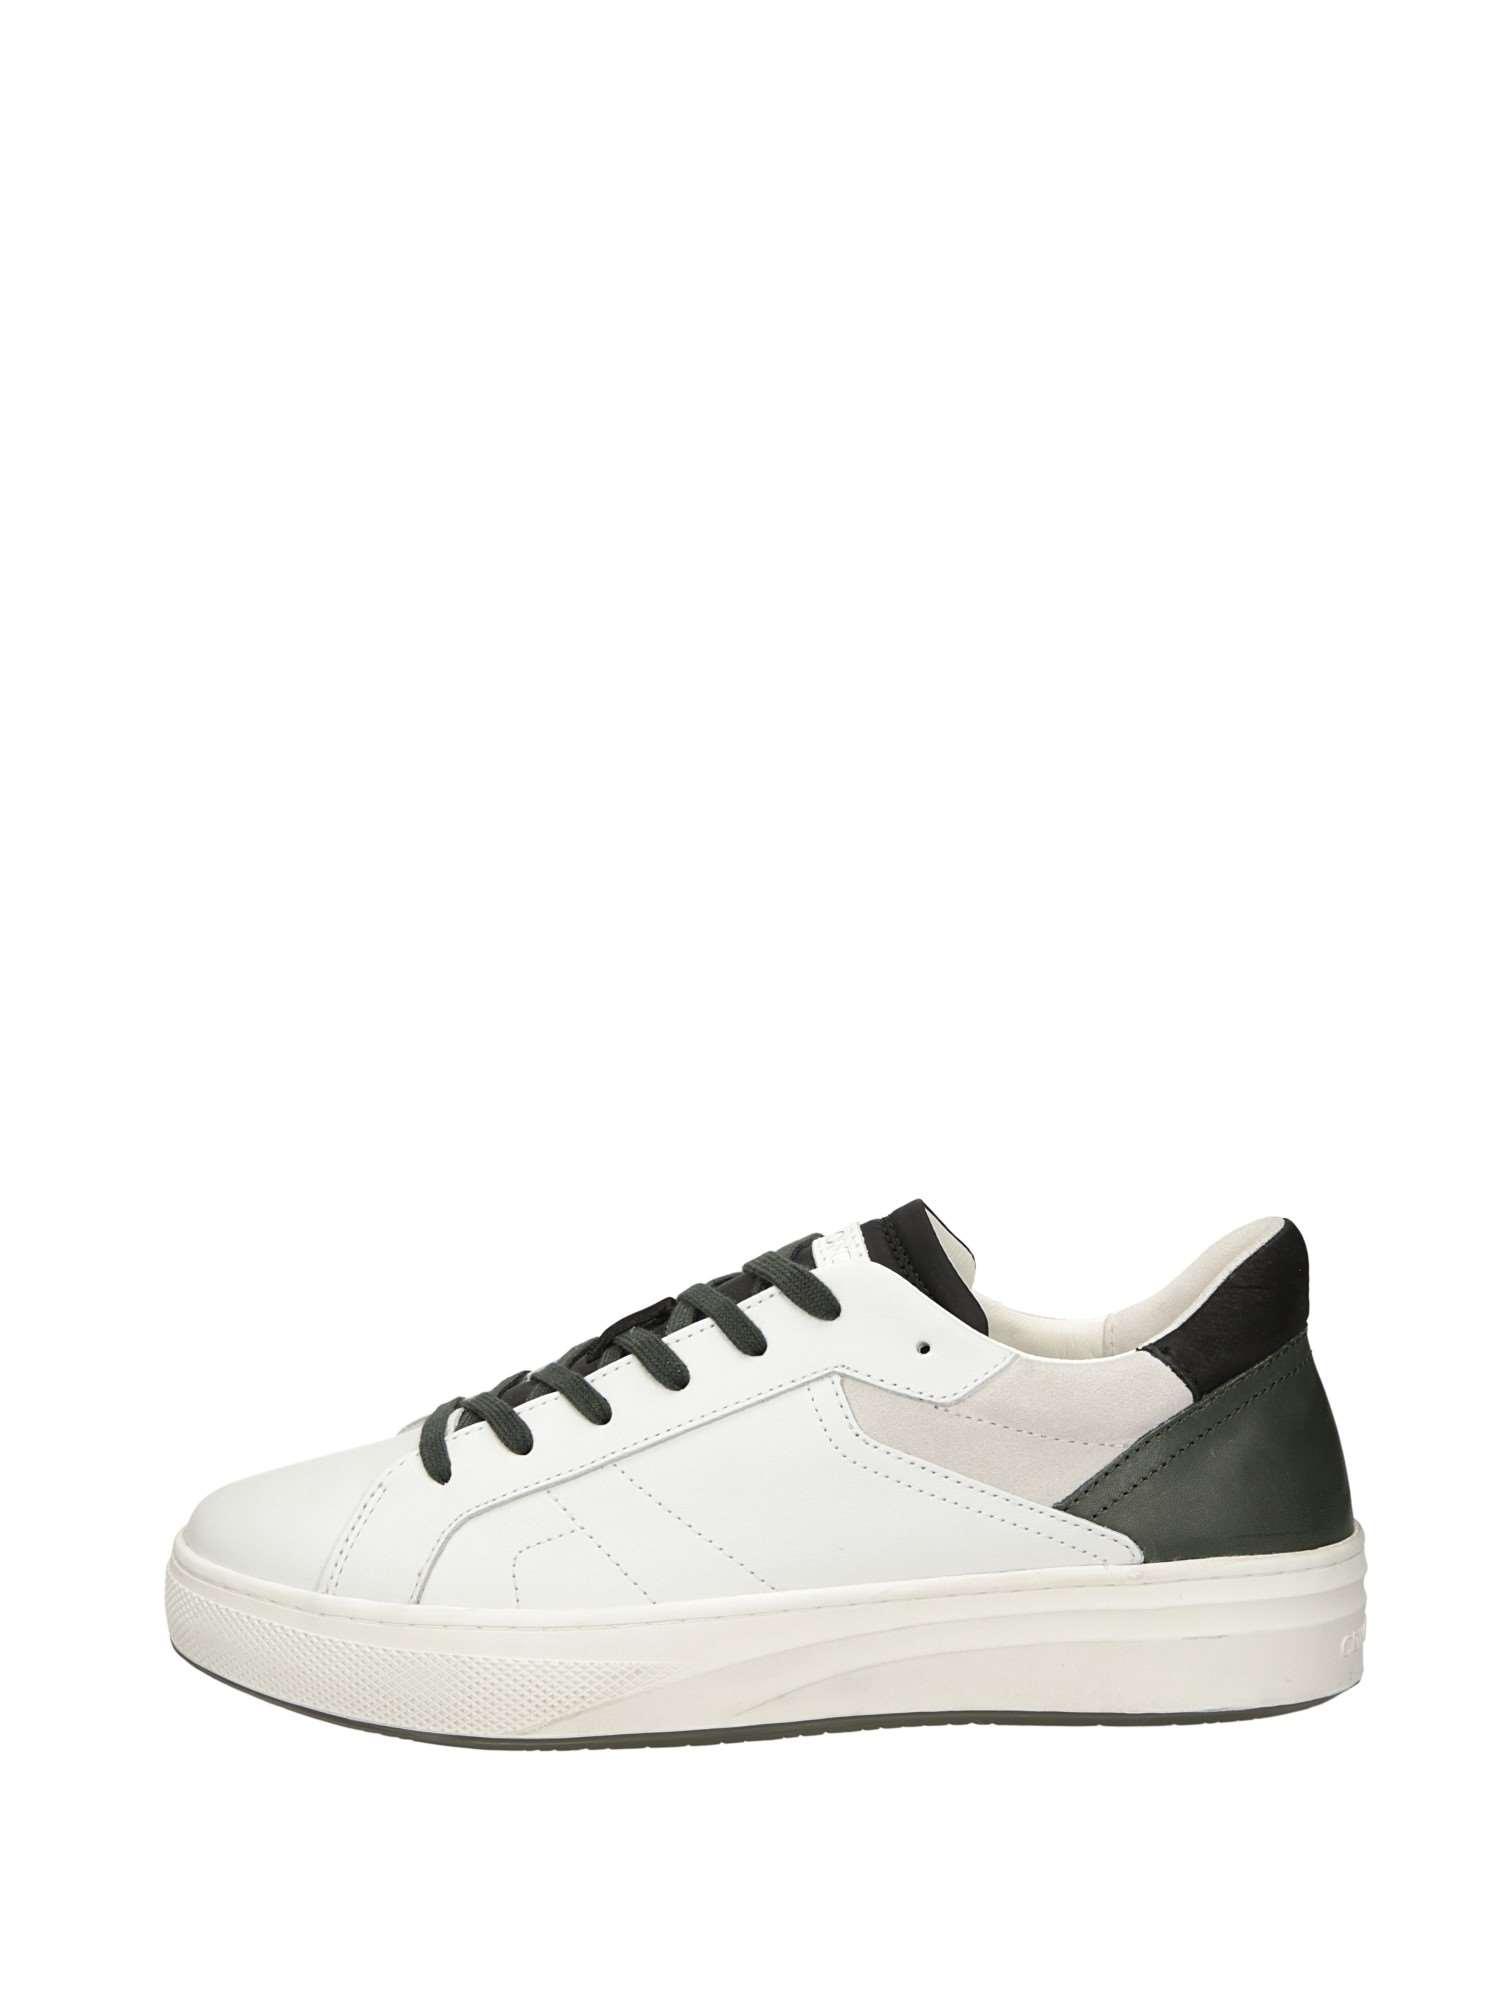 3074ef740d Crime London Sneakers Basse Uomo Bianco | Lalilina